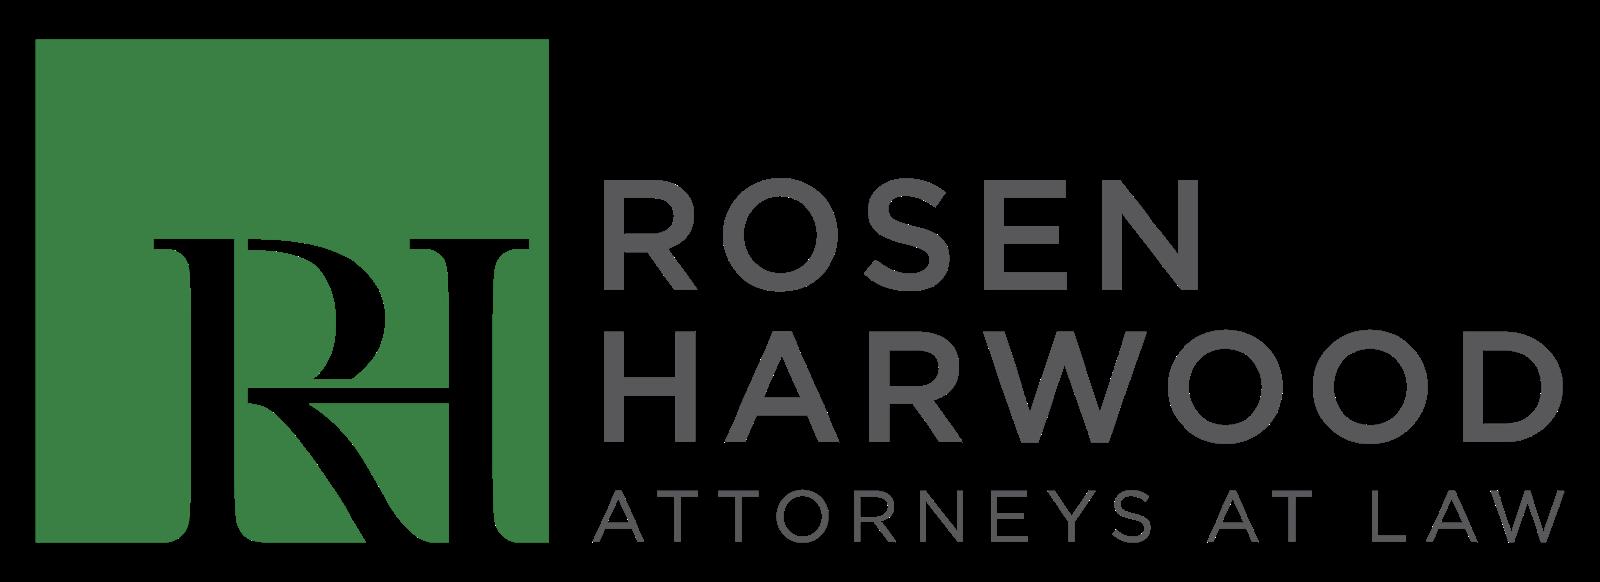 Rosen Harwood, P.A.